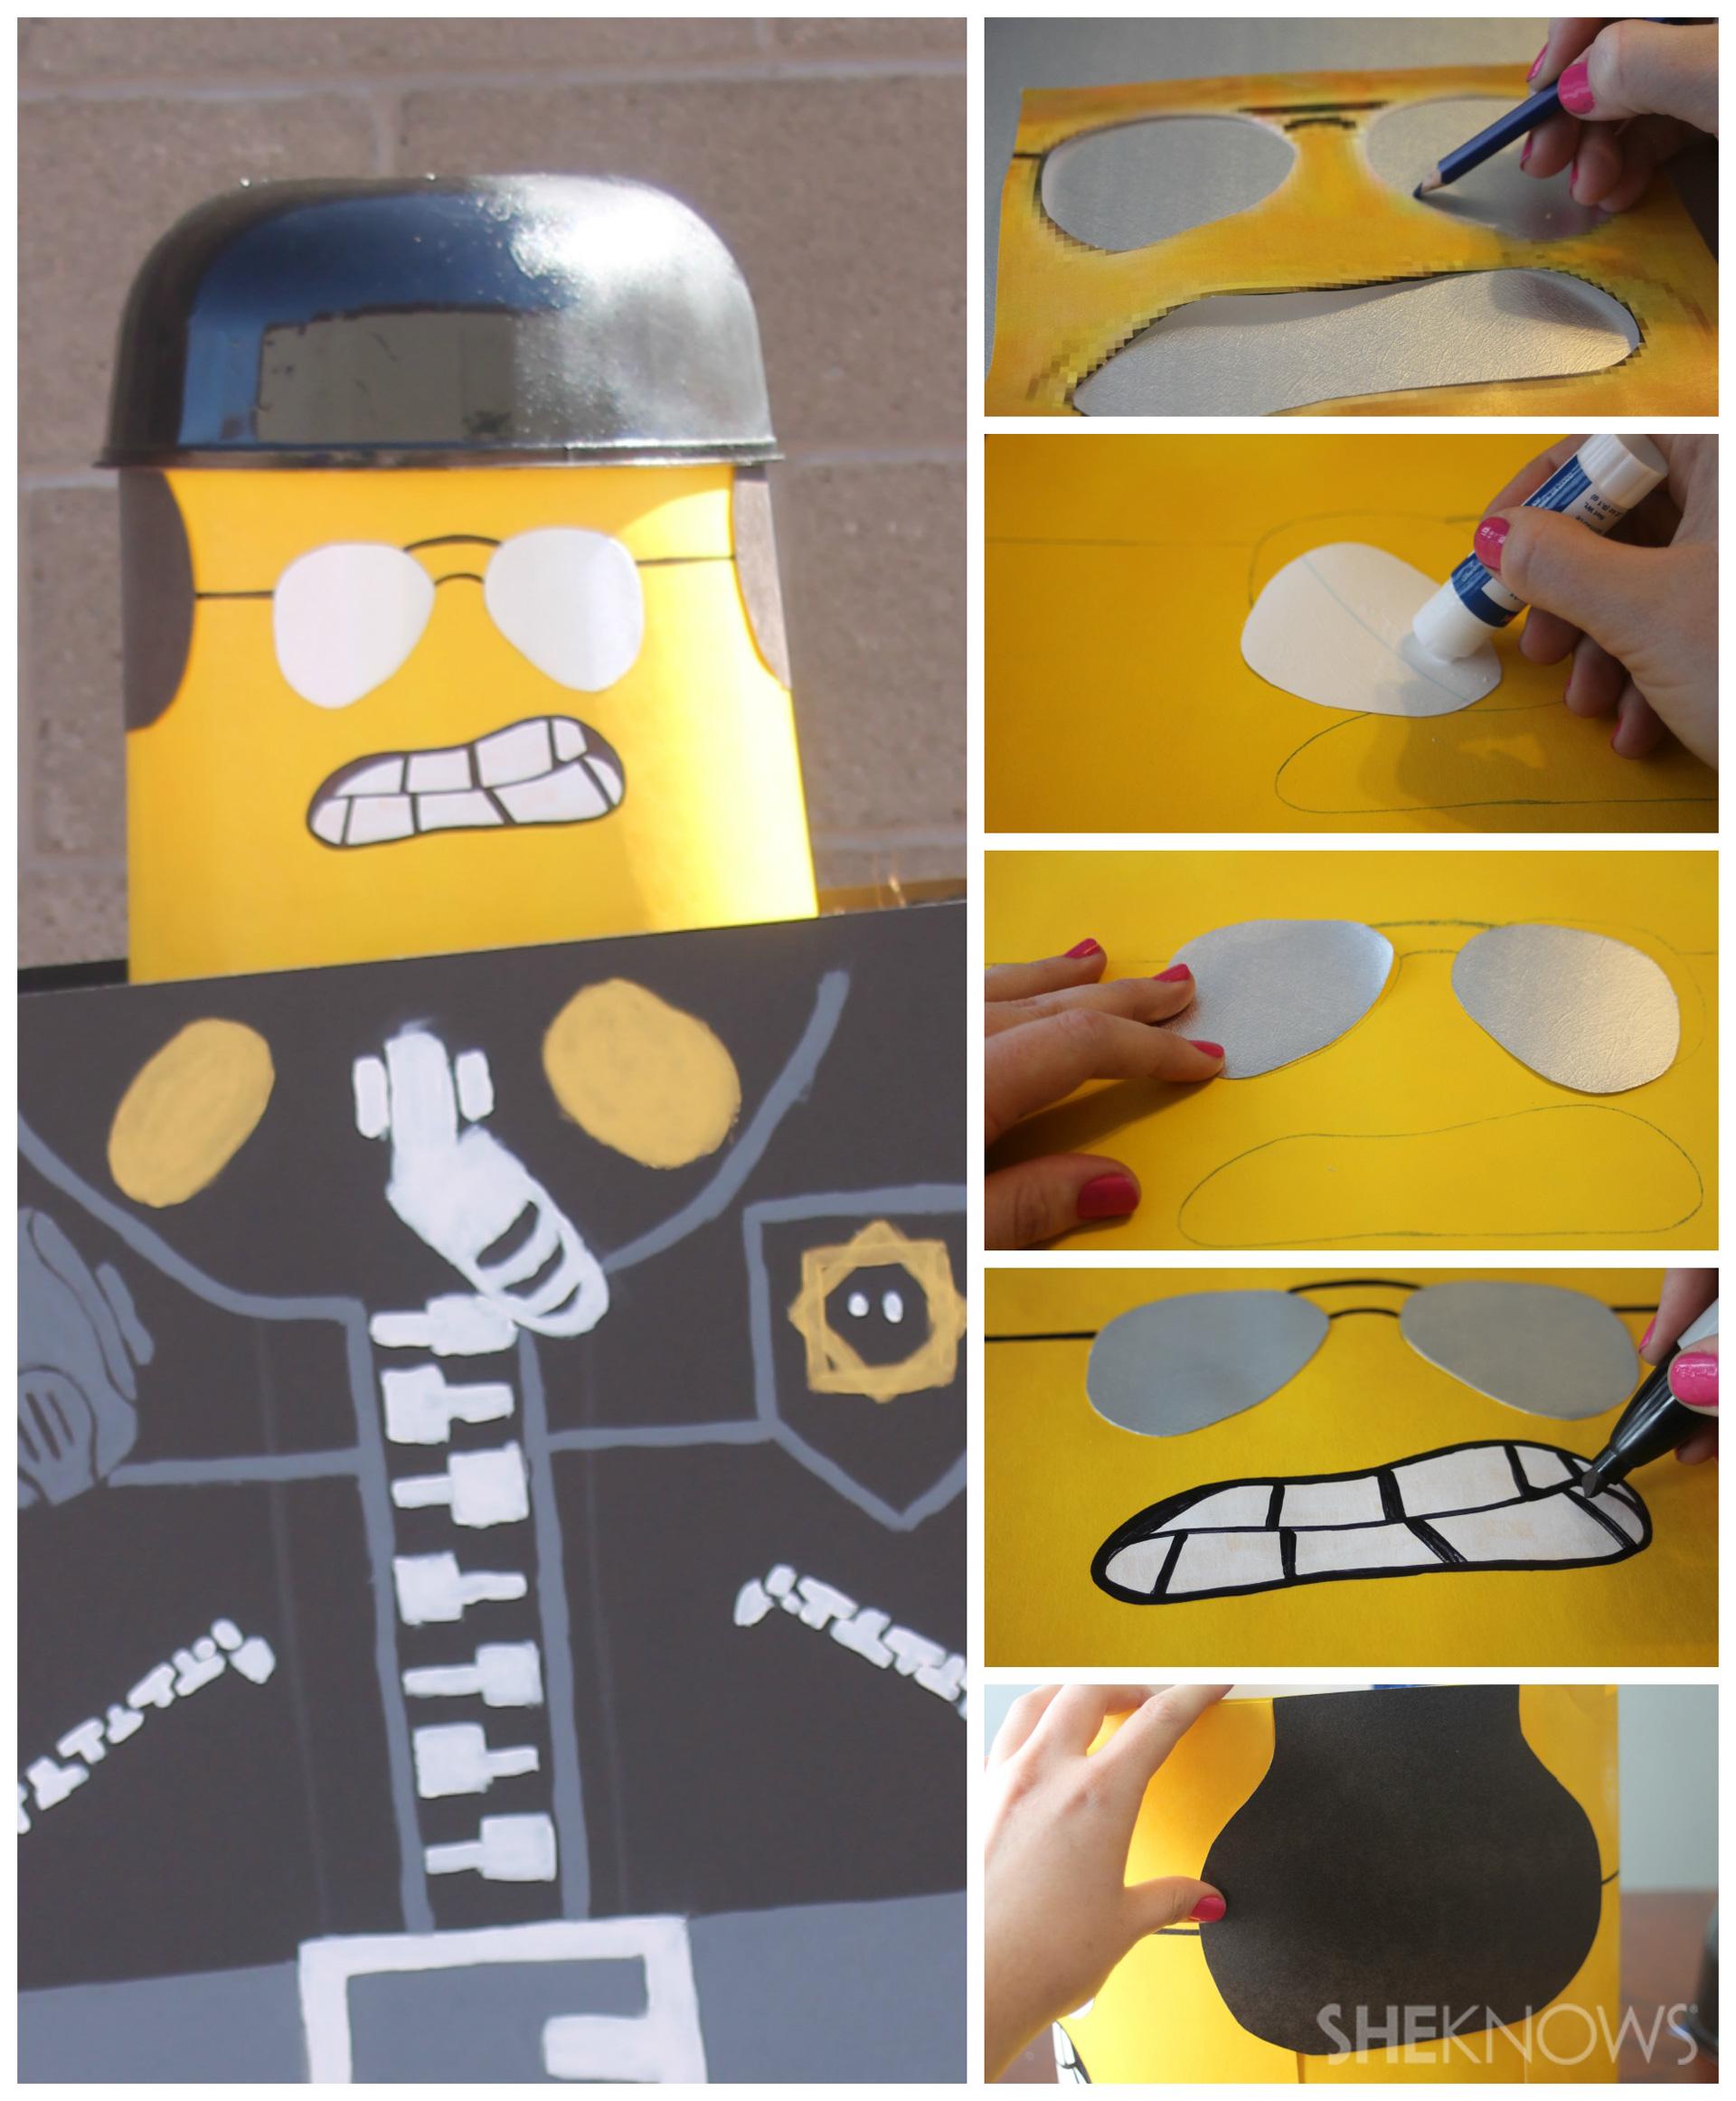 Step 3: Make the reversible head 2